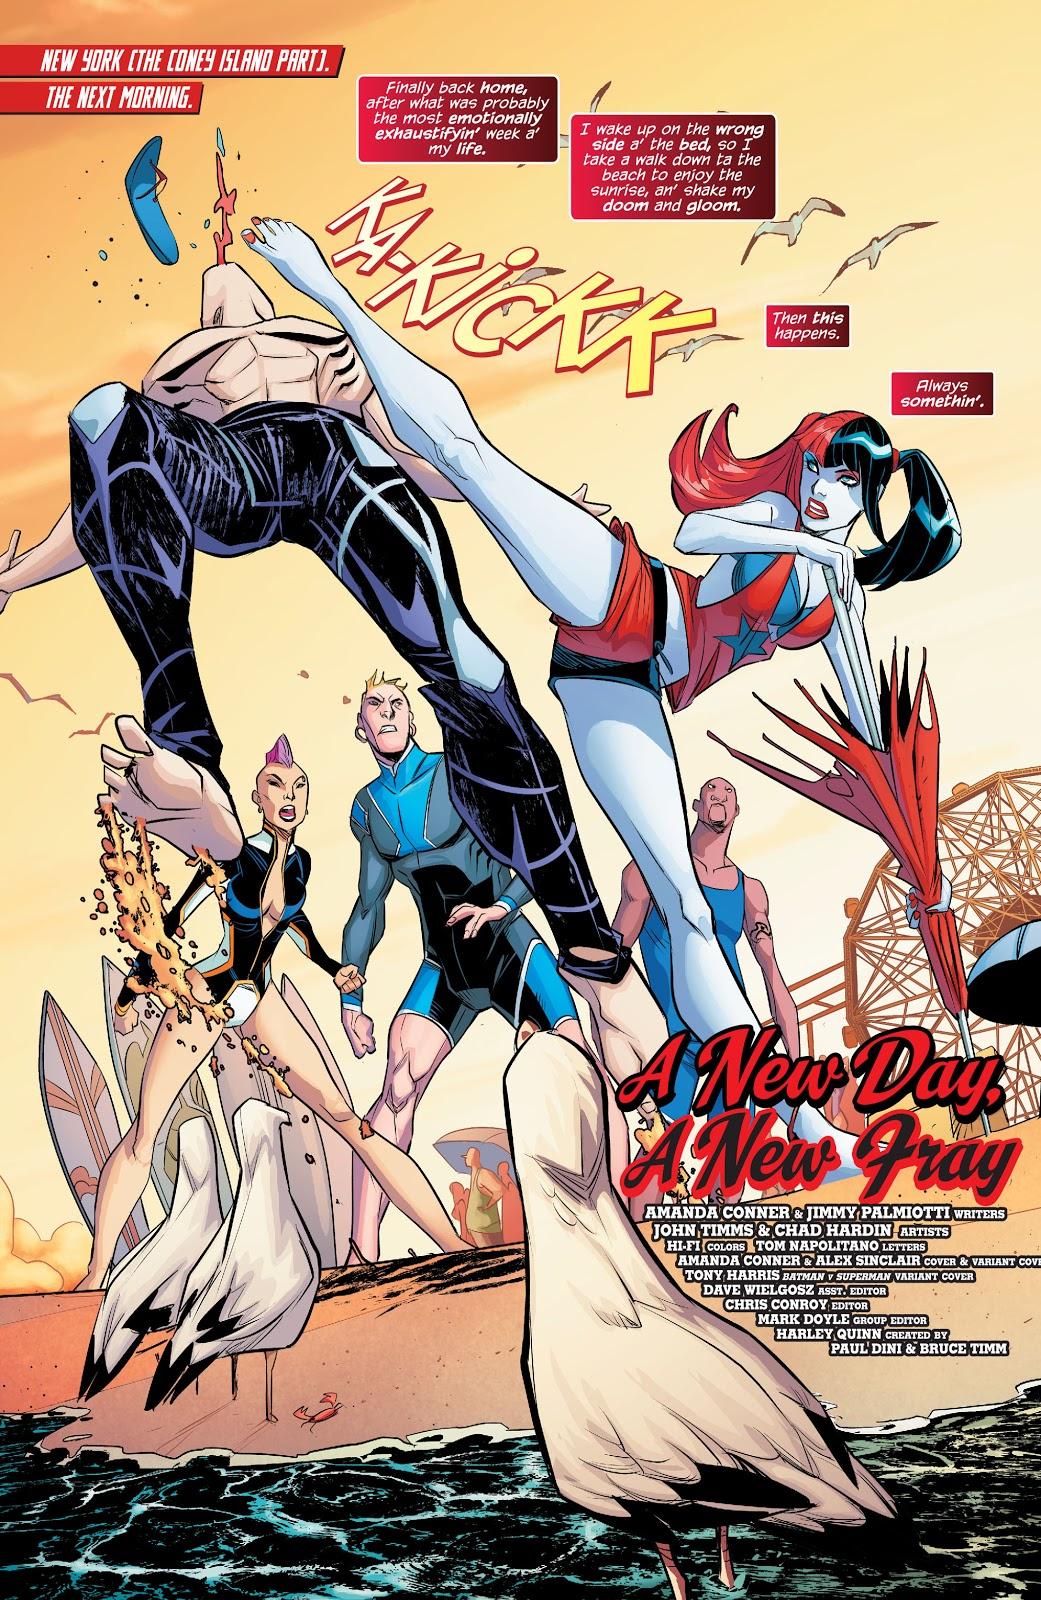 Harley Quinn Vol. 2 #26